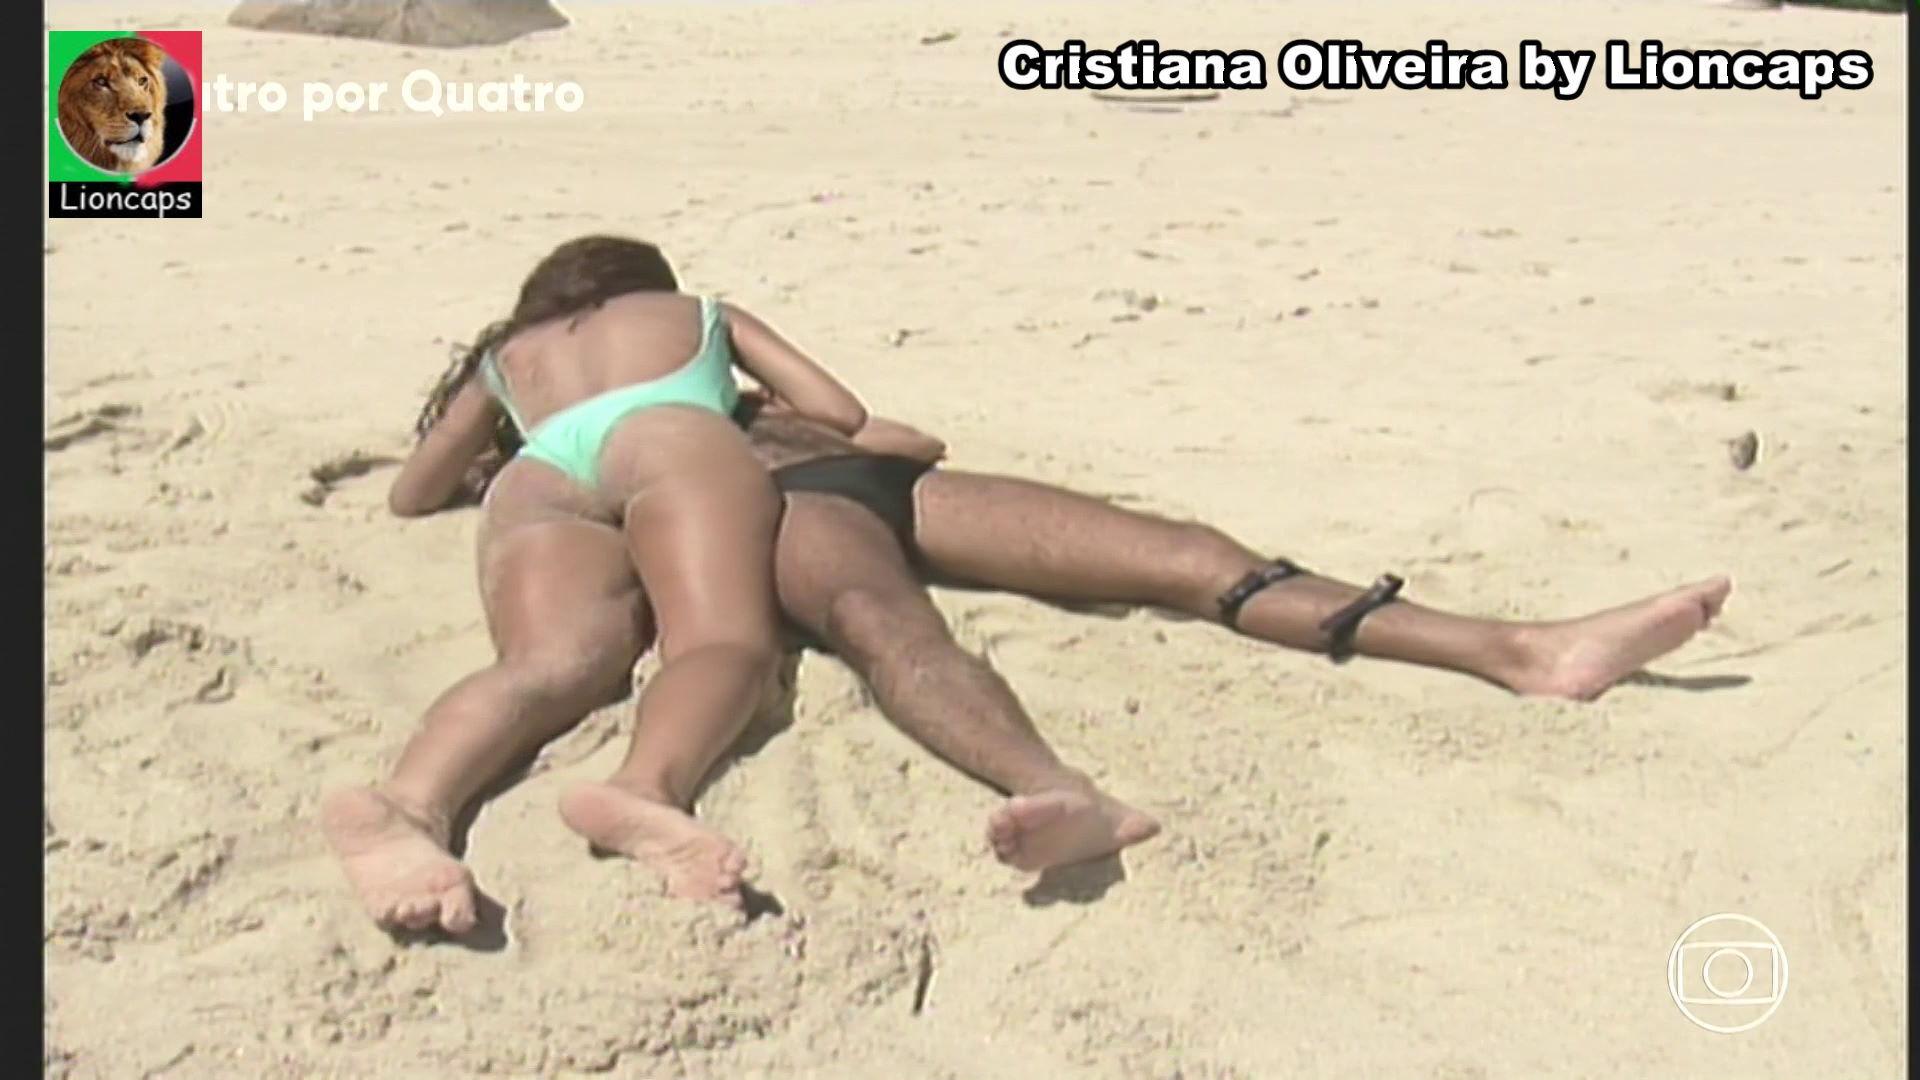 cristiana_oliveira_vs200604-088 (6).JPG